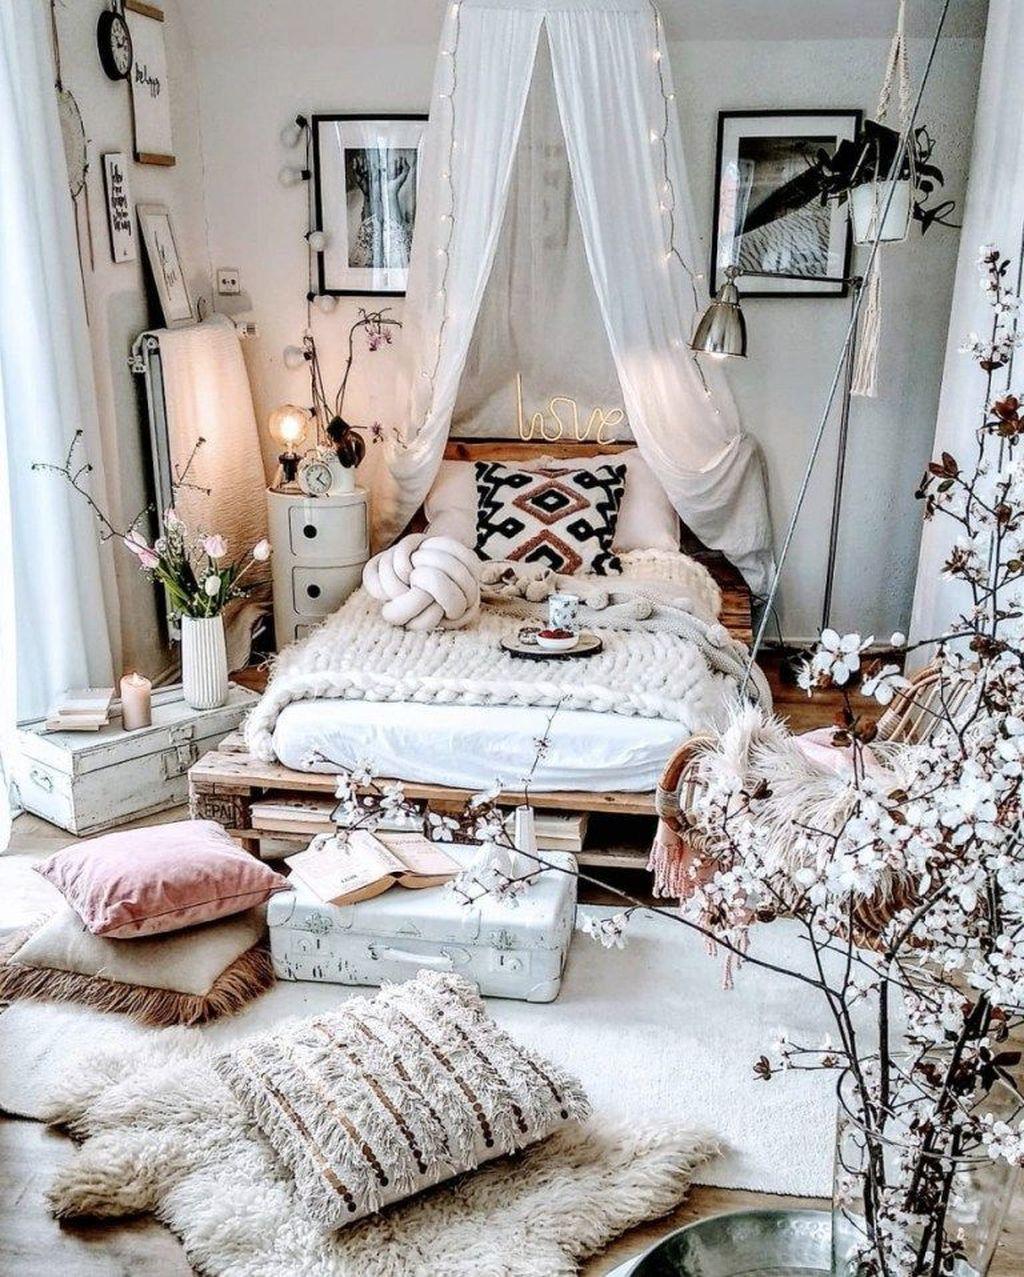 Awesome Boho Chic Bedroom Decor Ideas 06